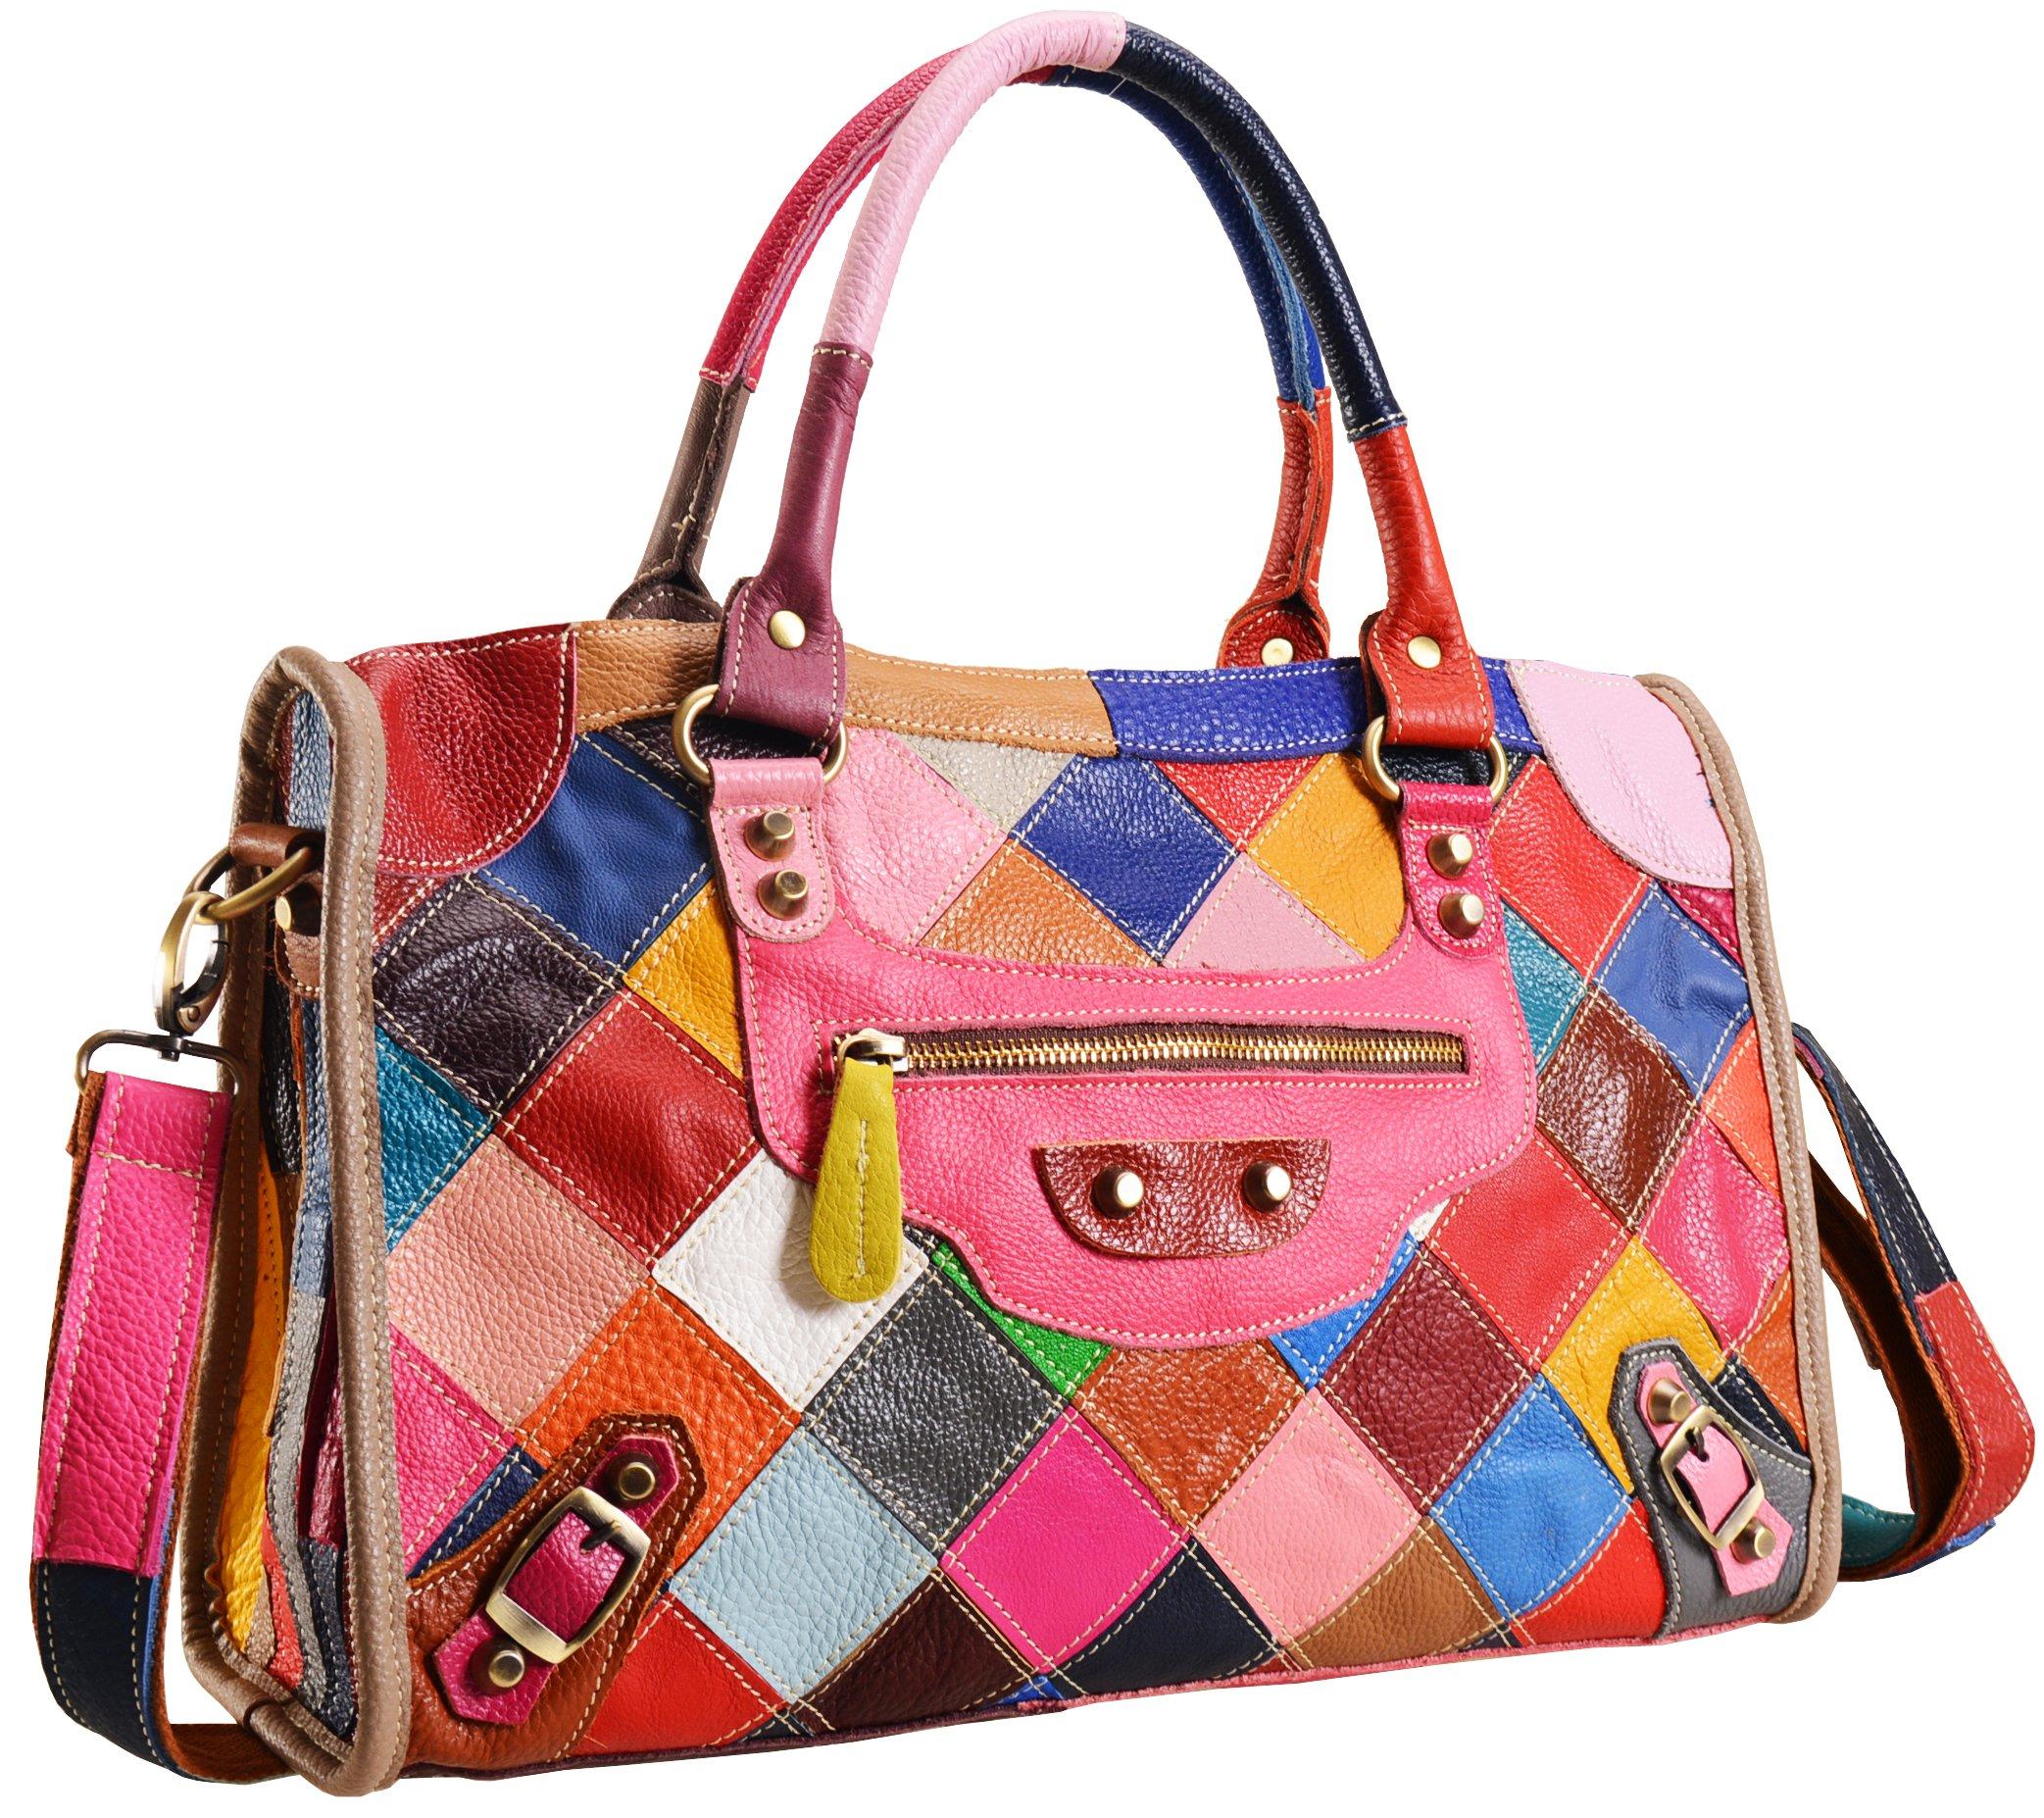 Heshe Women's Multi-color Shoulder Bag Hobo Tote Handbag Cross Body Purse (2B4001)